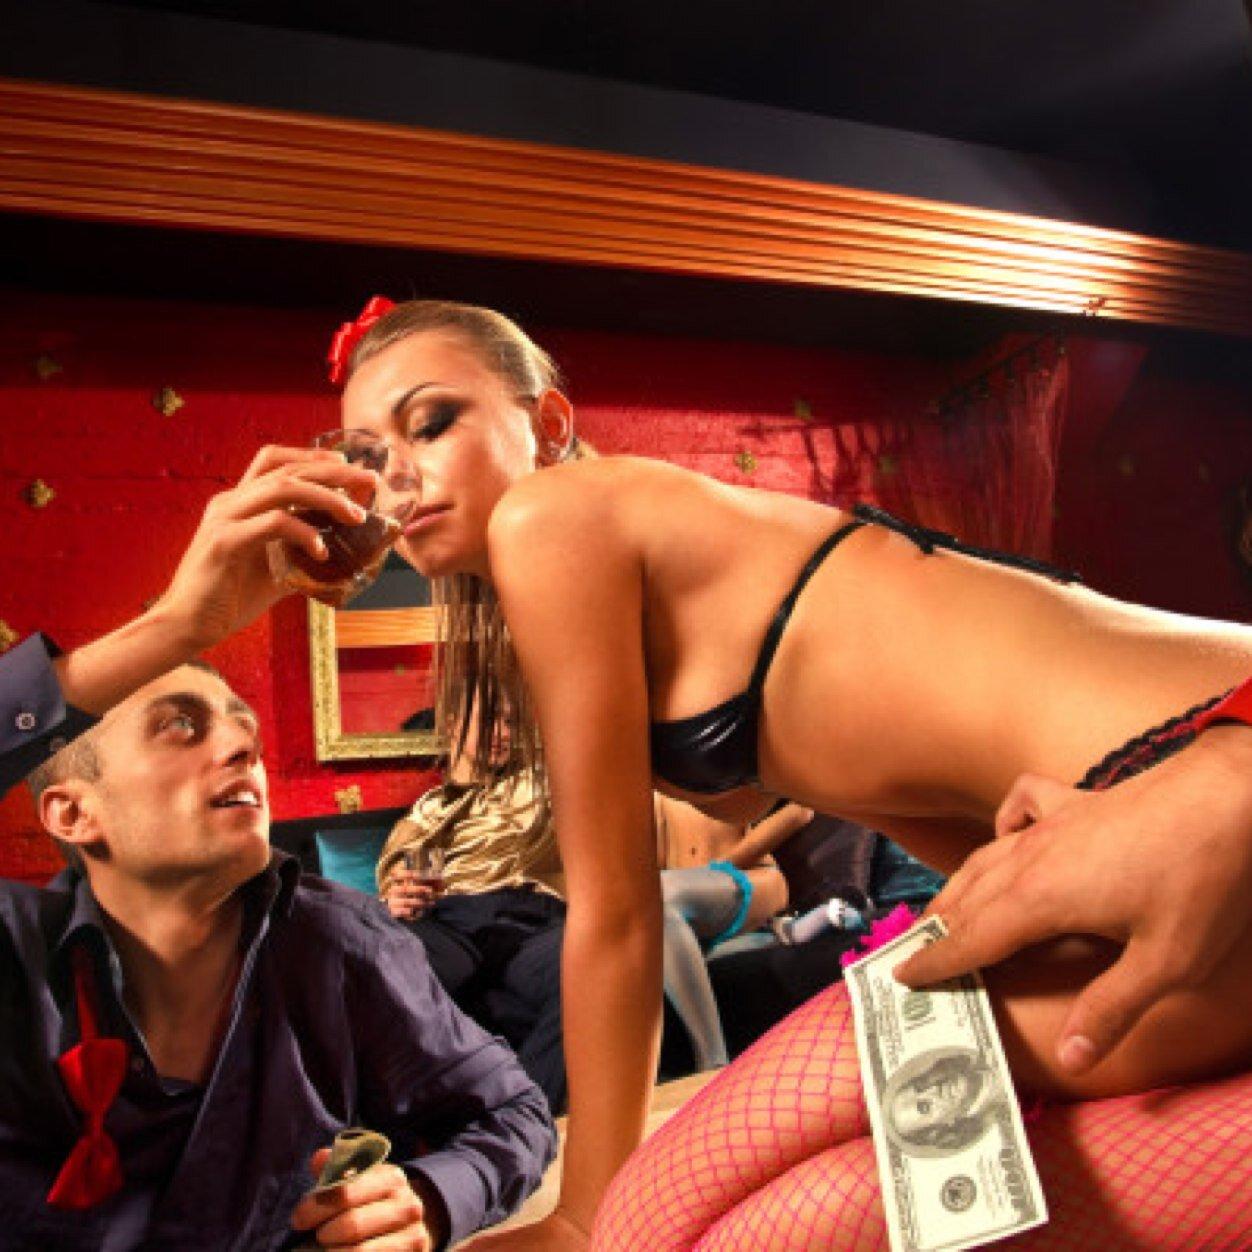 sexsy damer sex gdansk